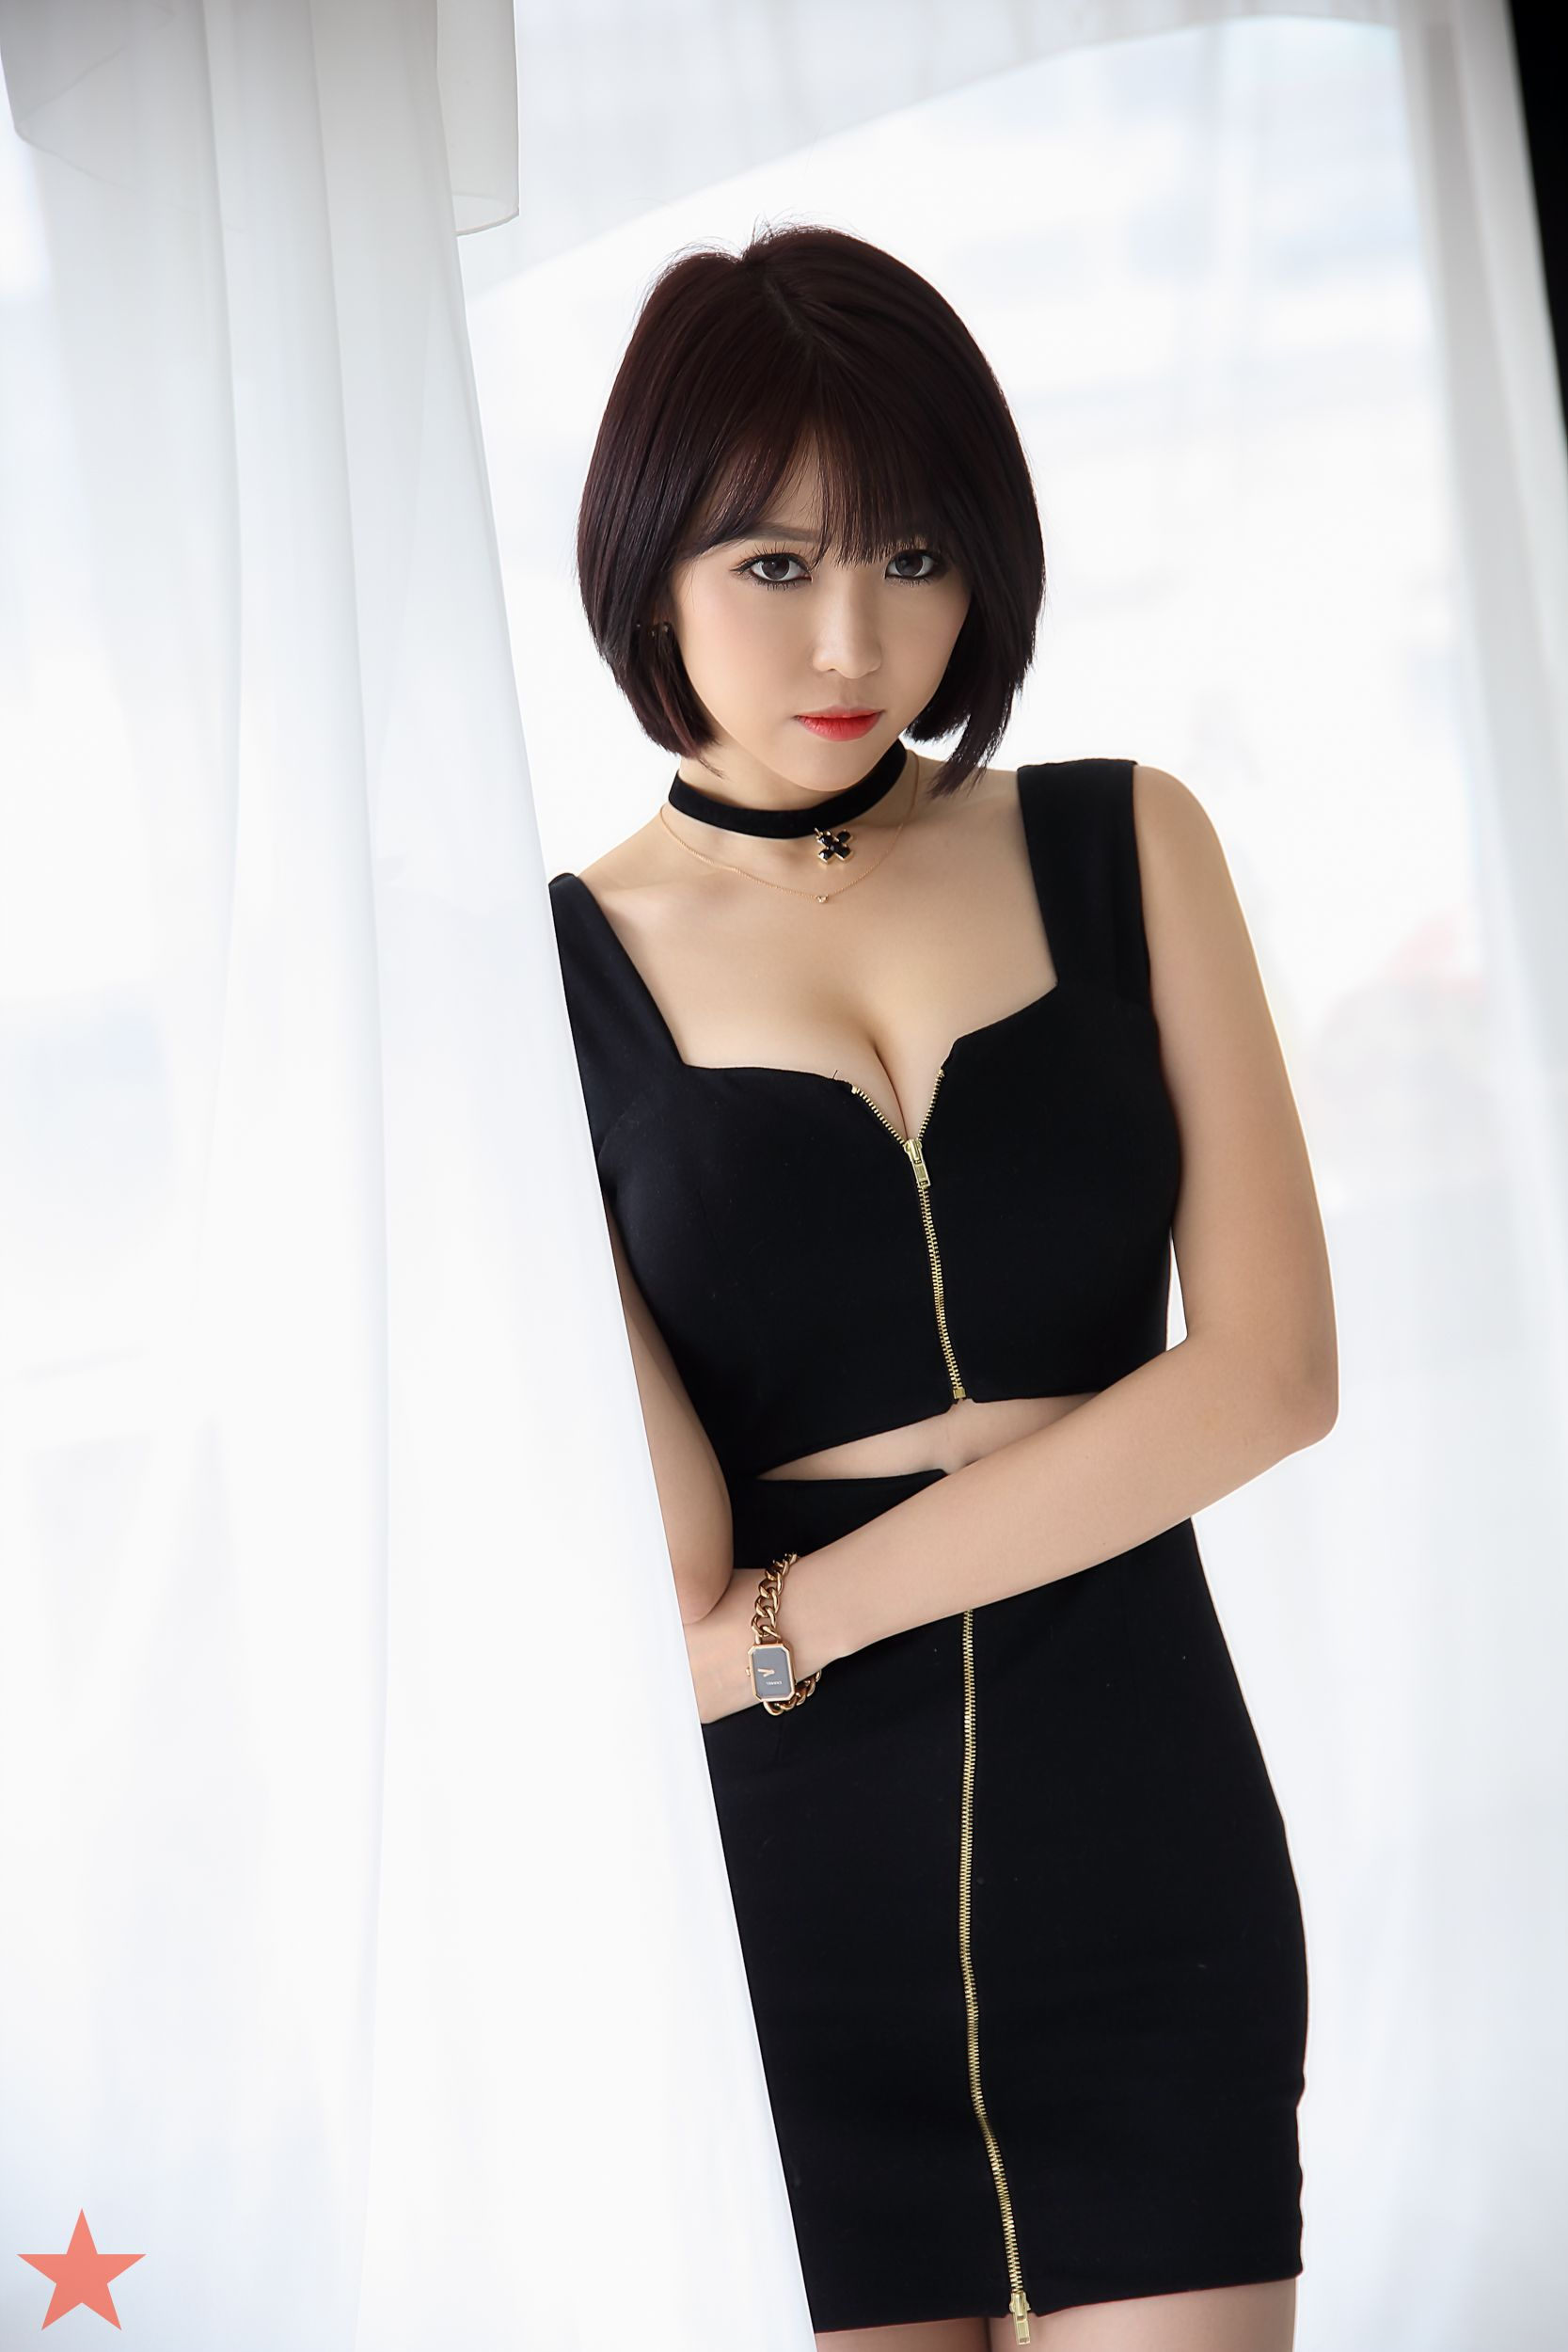 1000+ Images About Lee Eun Hye 이은혜 李恩慧 On Pinterest